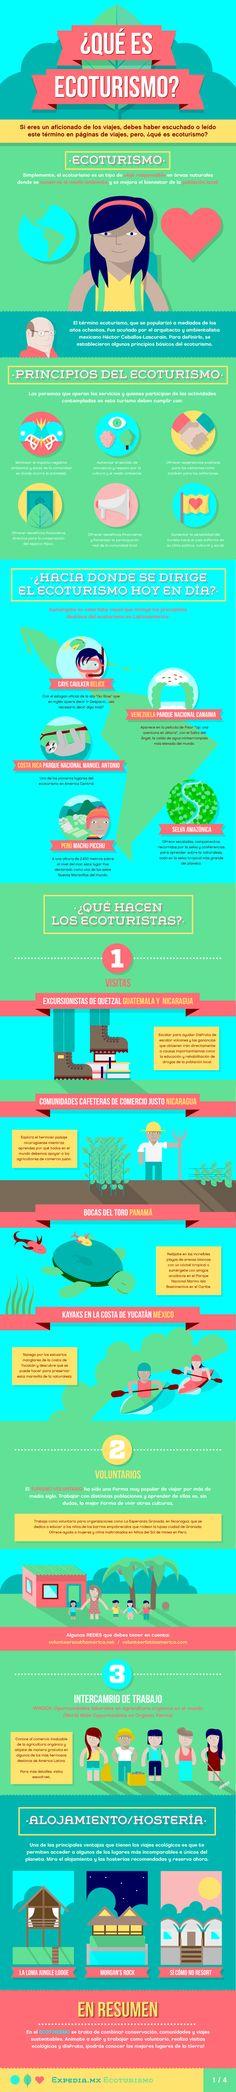 Qué es Ecoturismo #infografia #infographic #tourism